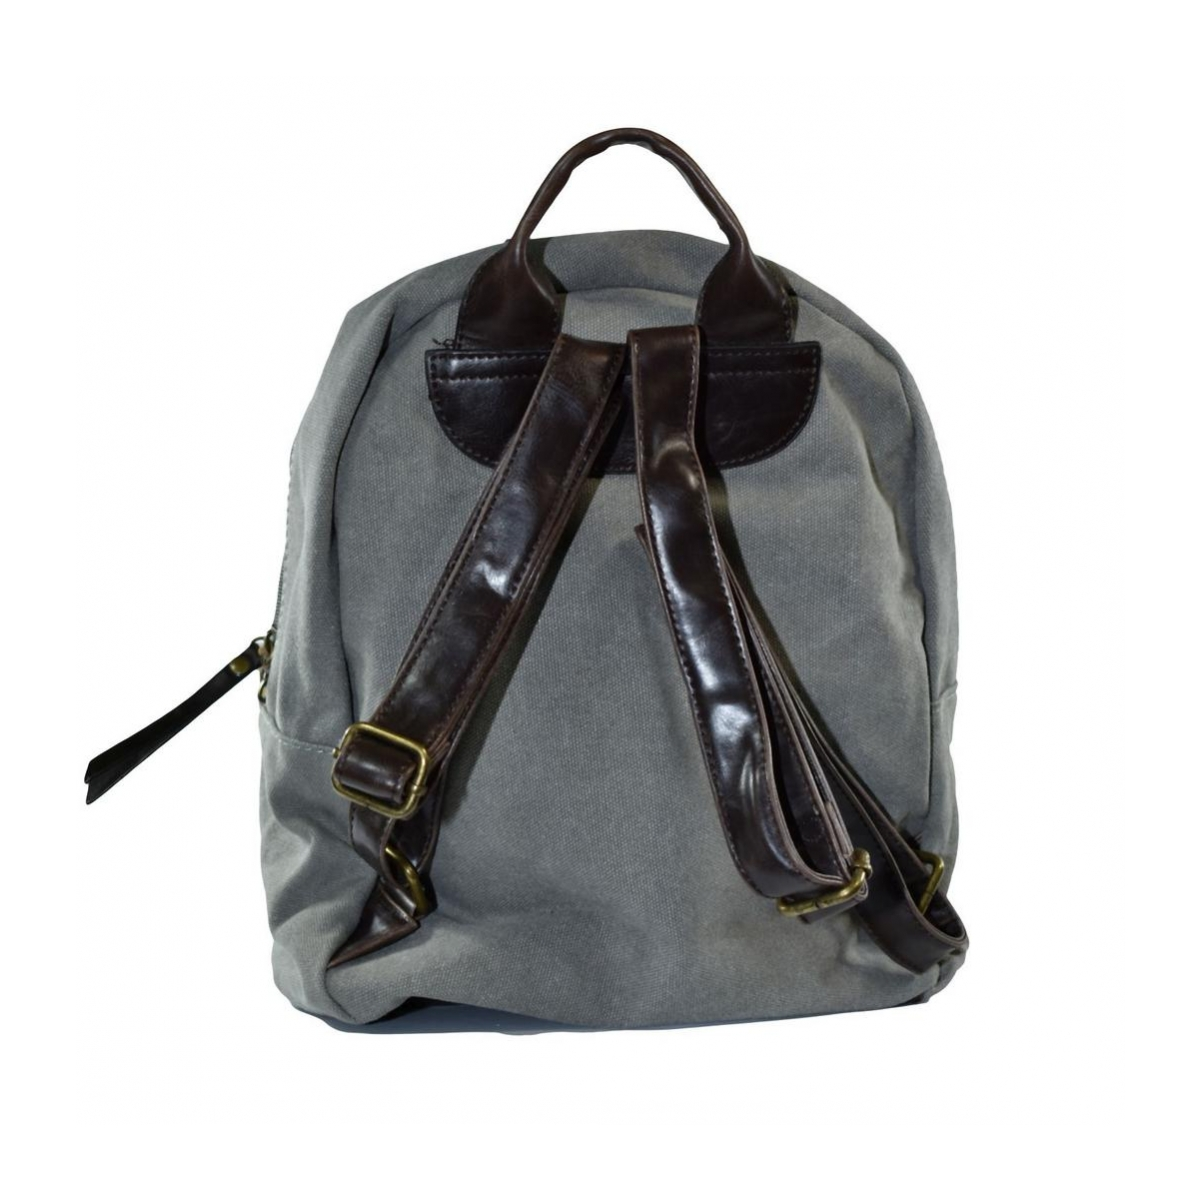 d26e742975 Dámsky sivý ruksak TAMBI